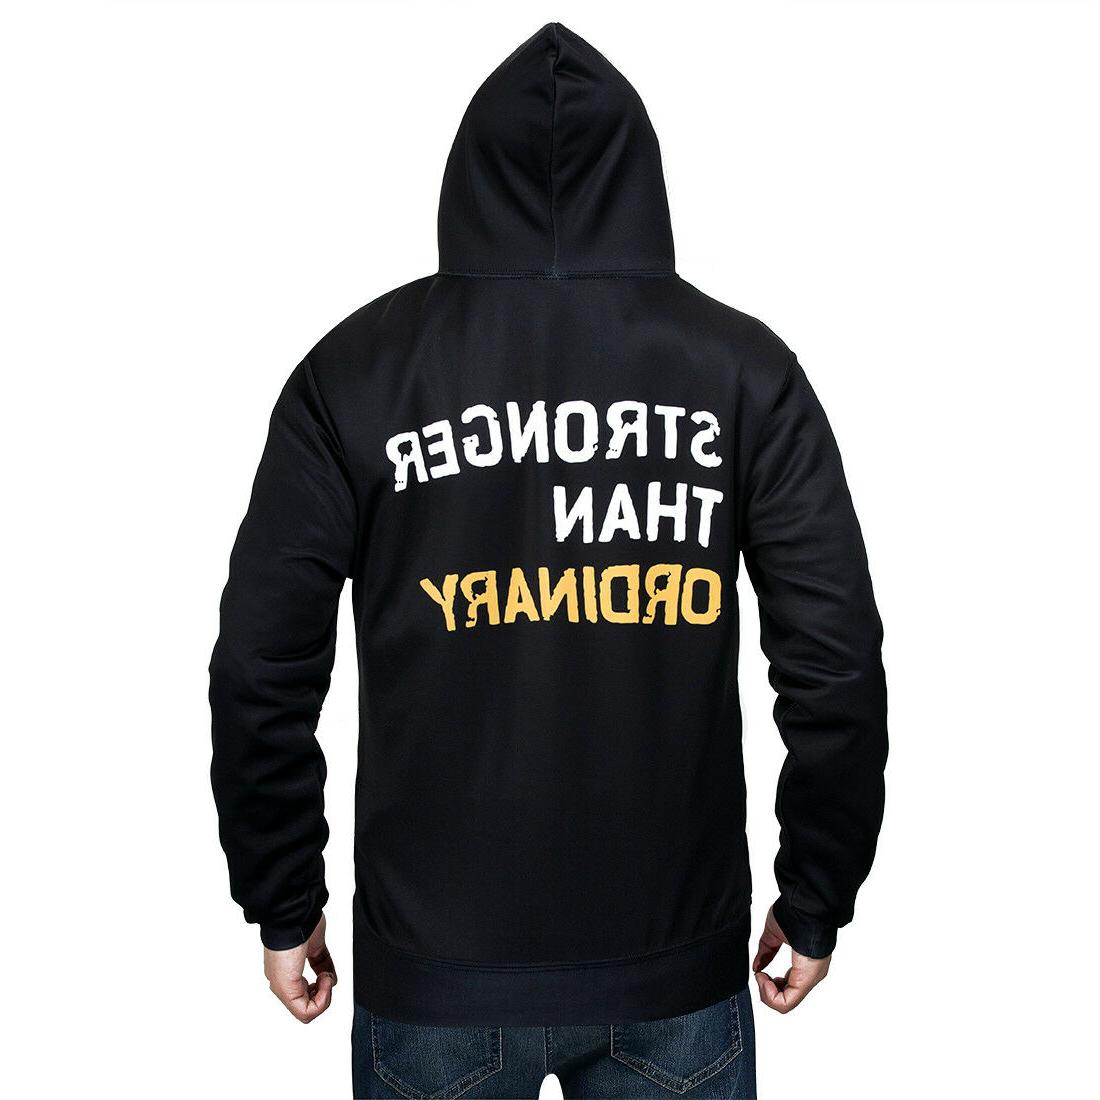 Women/Men UFC Hoodies Print Marvel Venom Sweatshirts Sweater